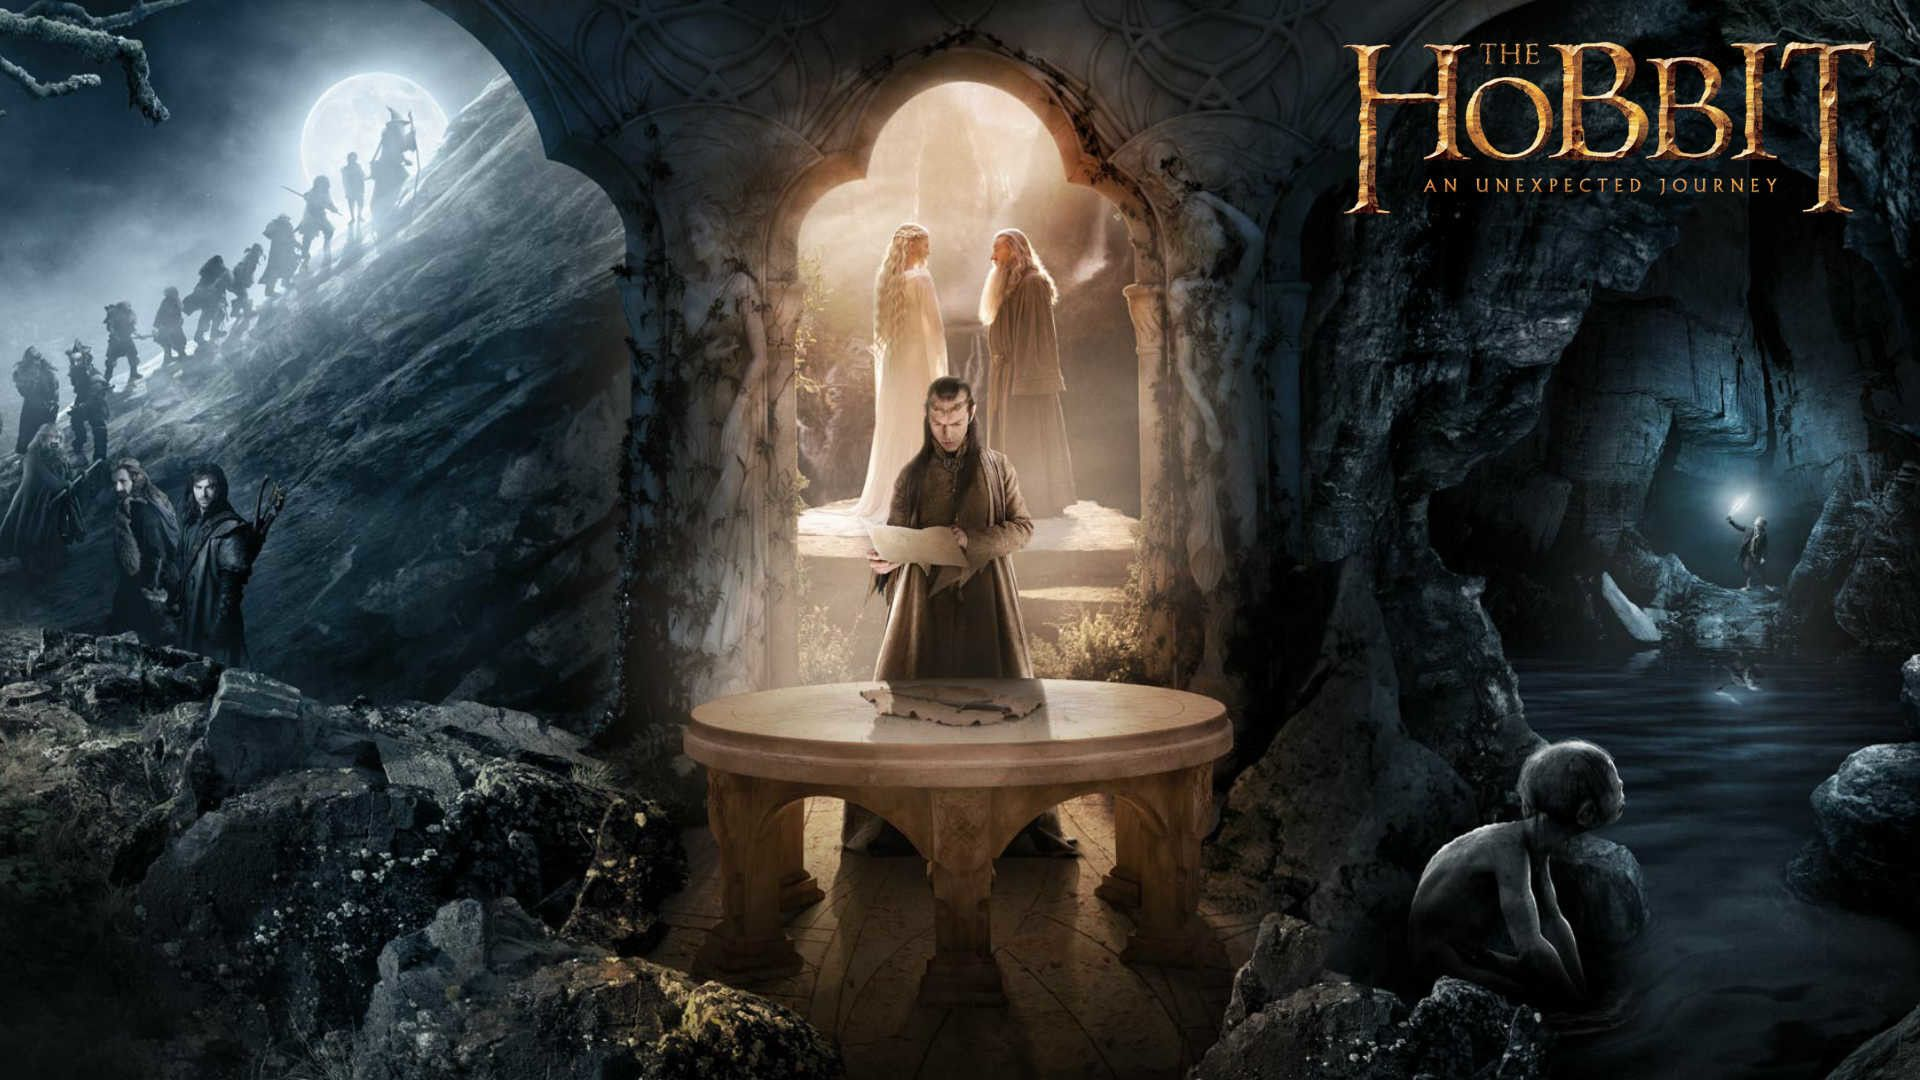 The Hobbit Wallpaper Hd 81 Images The Hobbit Best Background Images 4k Wallpaper For Mobile